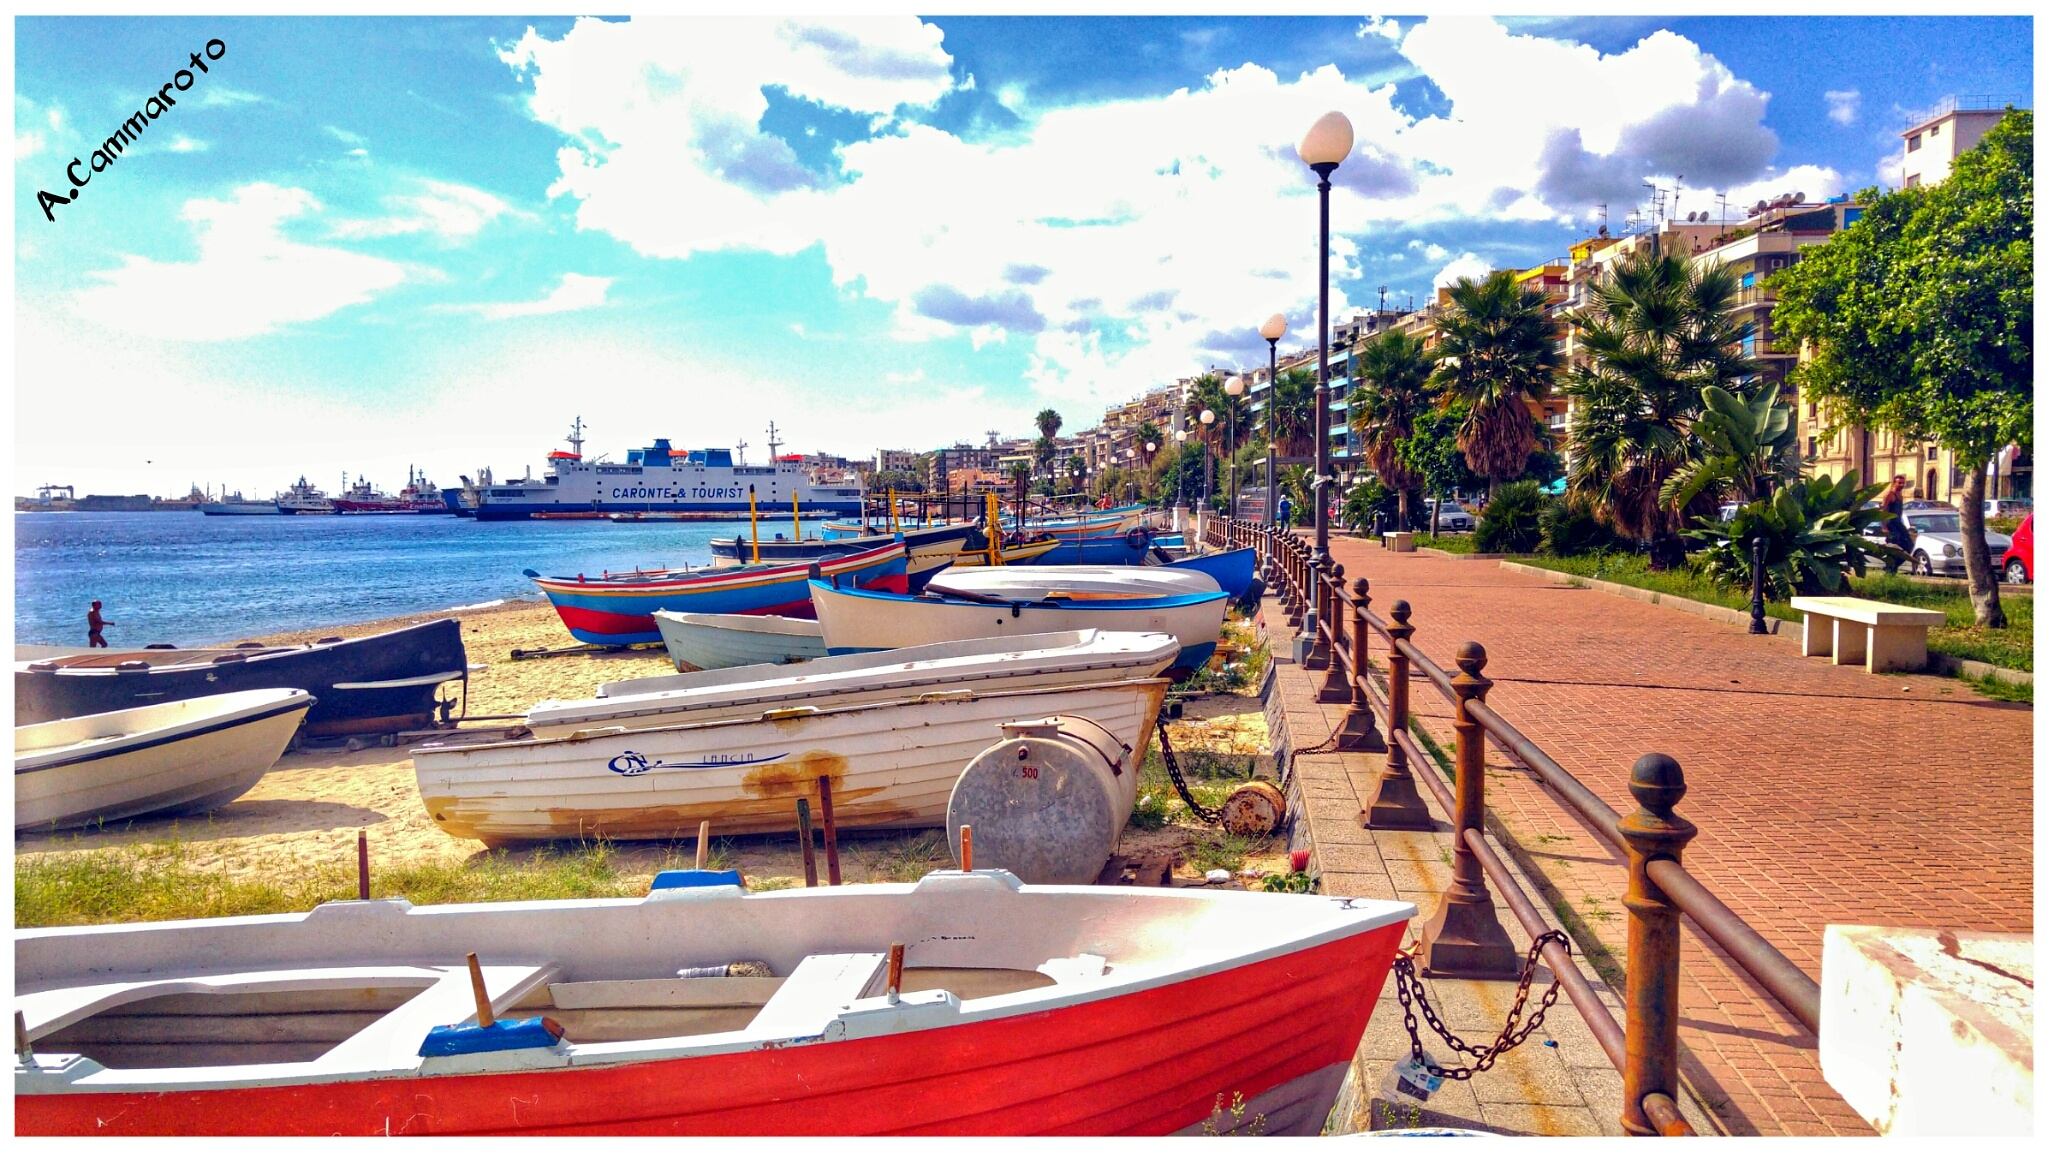 Seafront -Messina by antonio.cammaroto.64